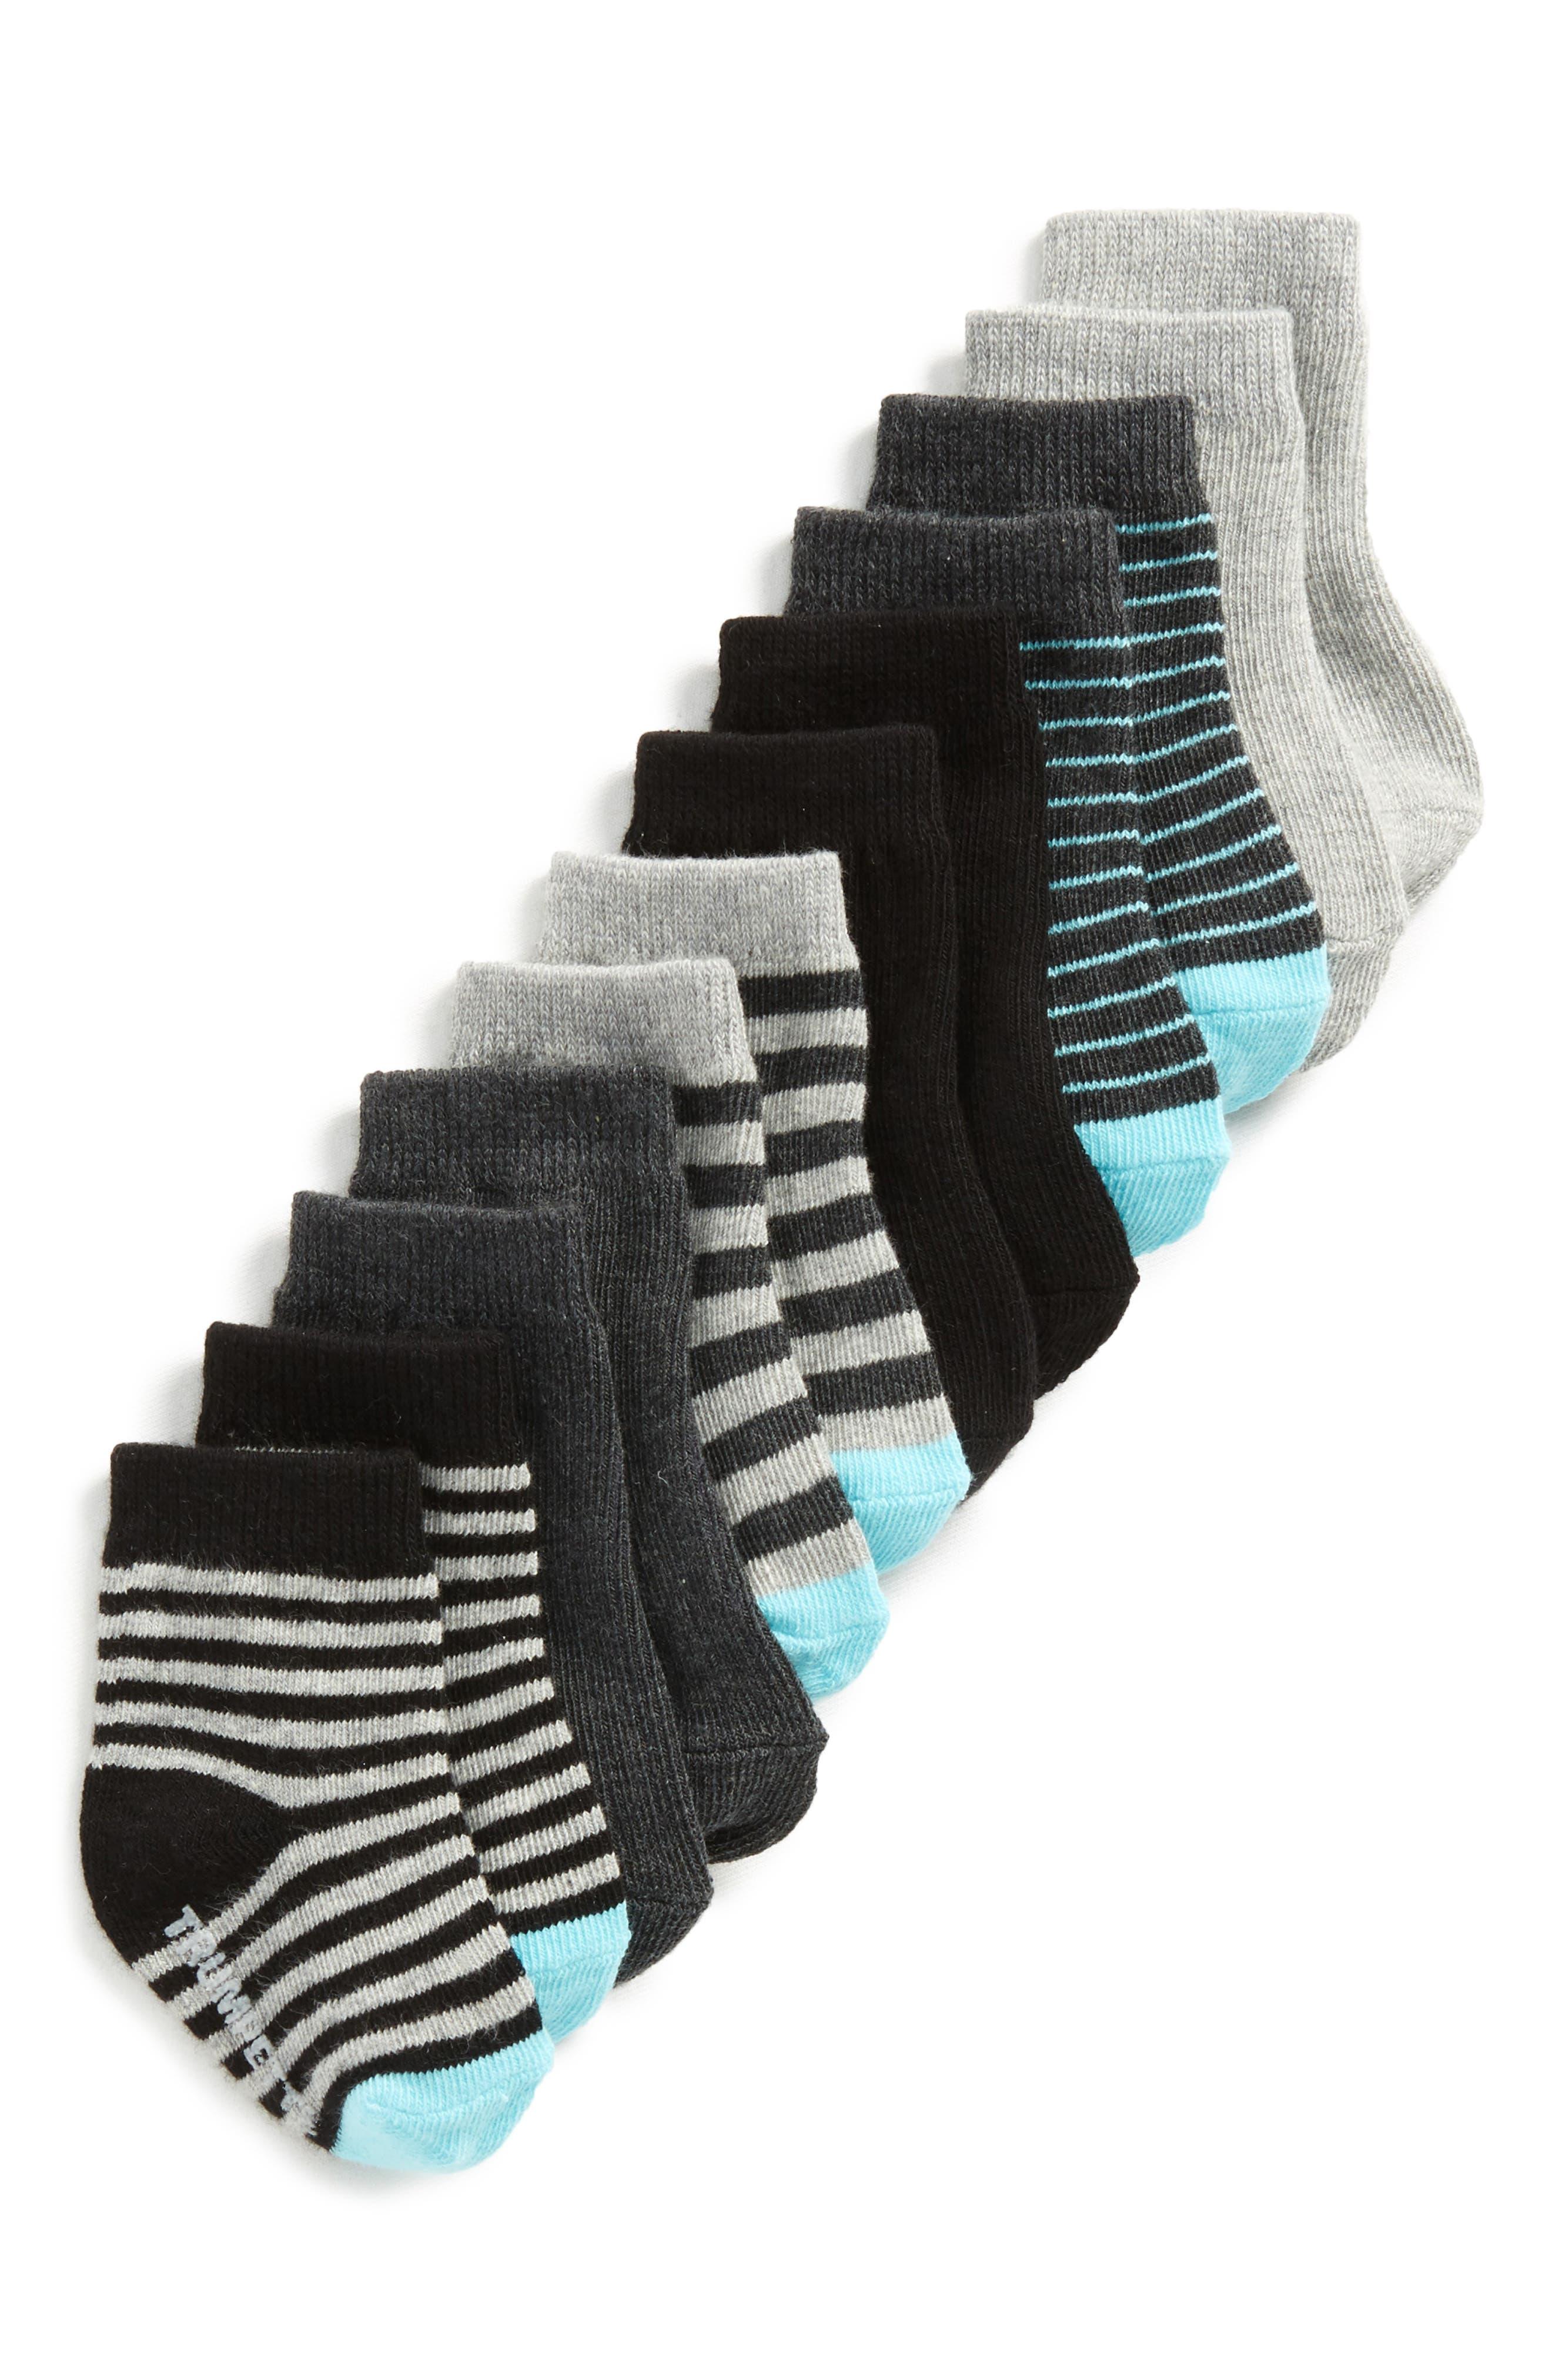 Finn 6-Pack Socks,                             Main thumbnail 1, color,                             Assorted